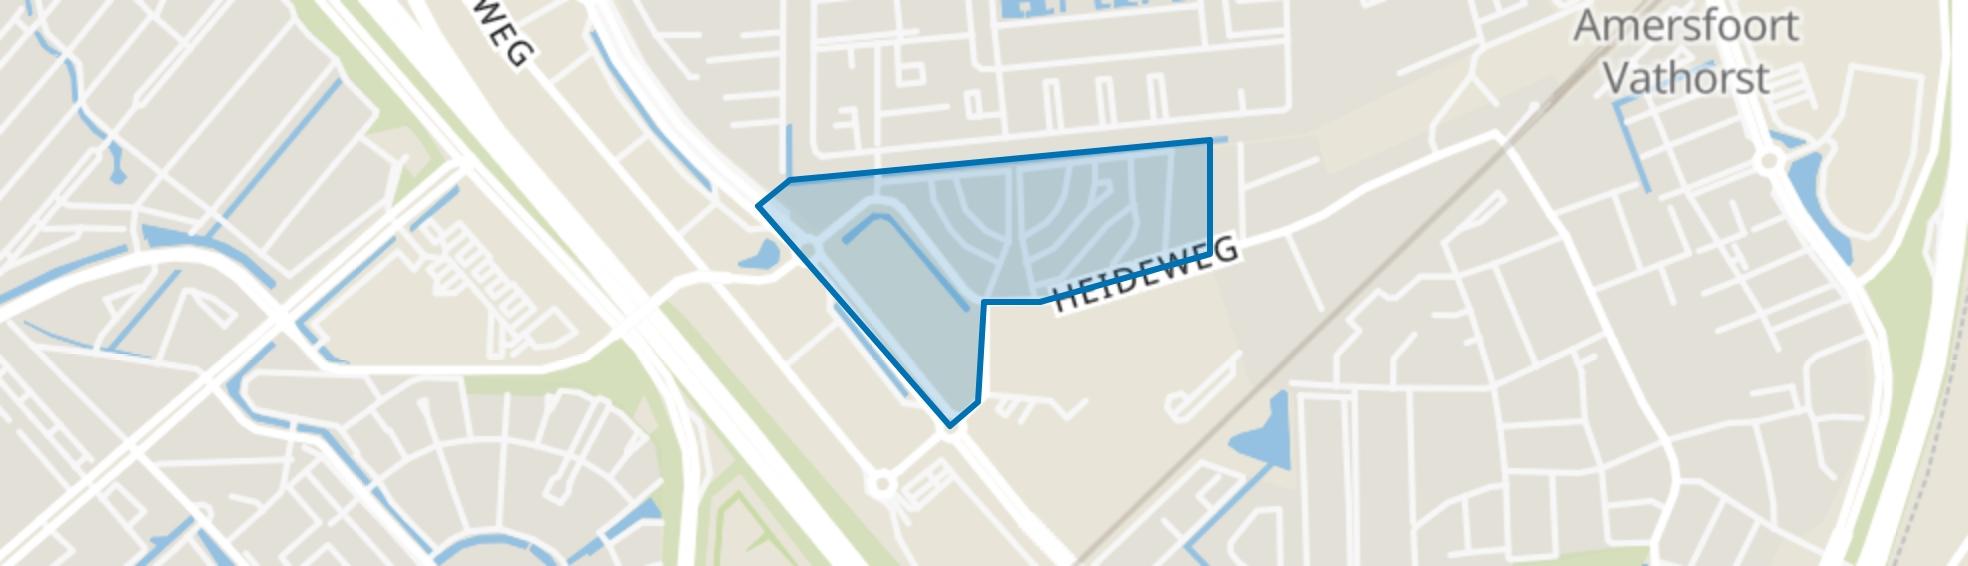 Cycladen, Amersfoort map